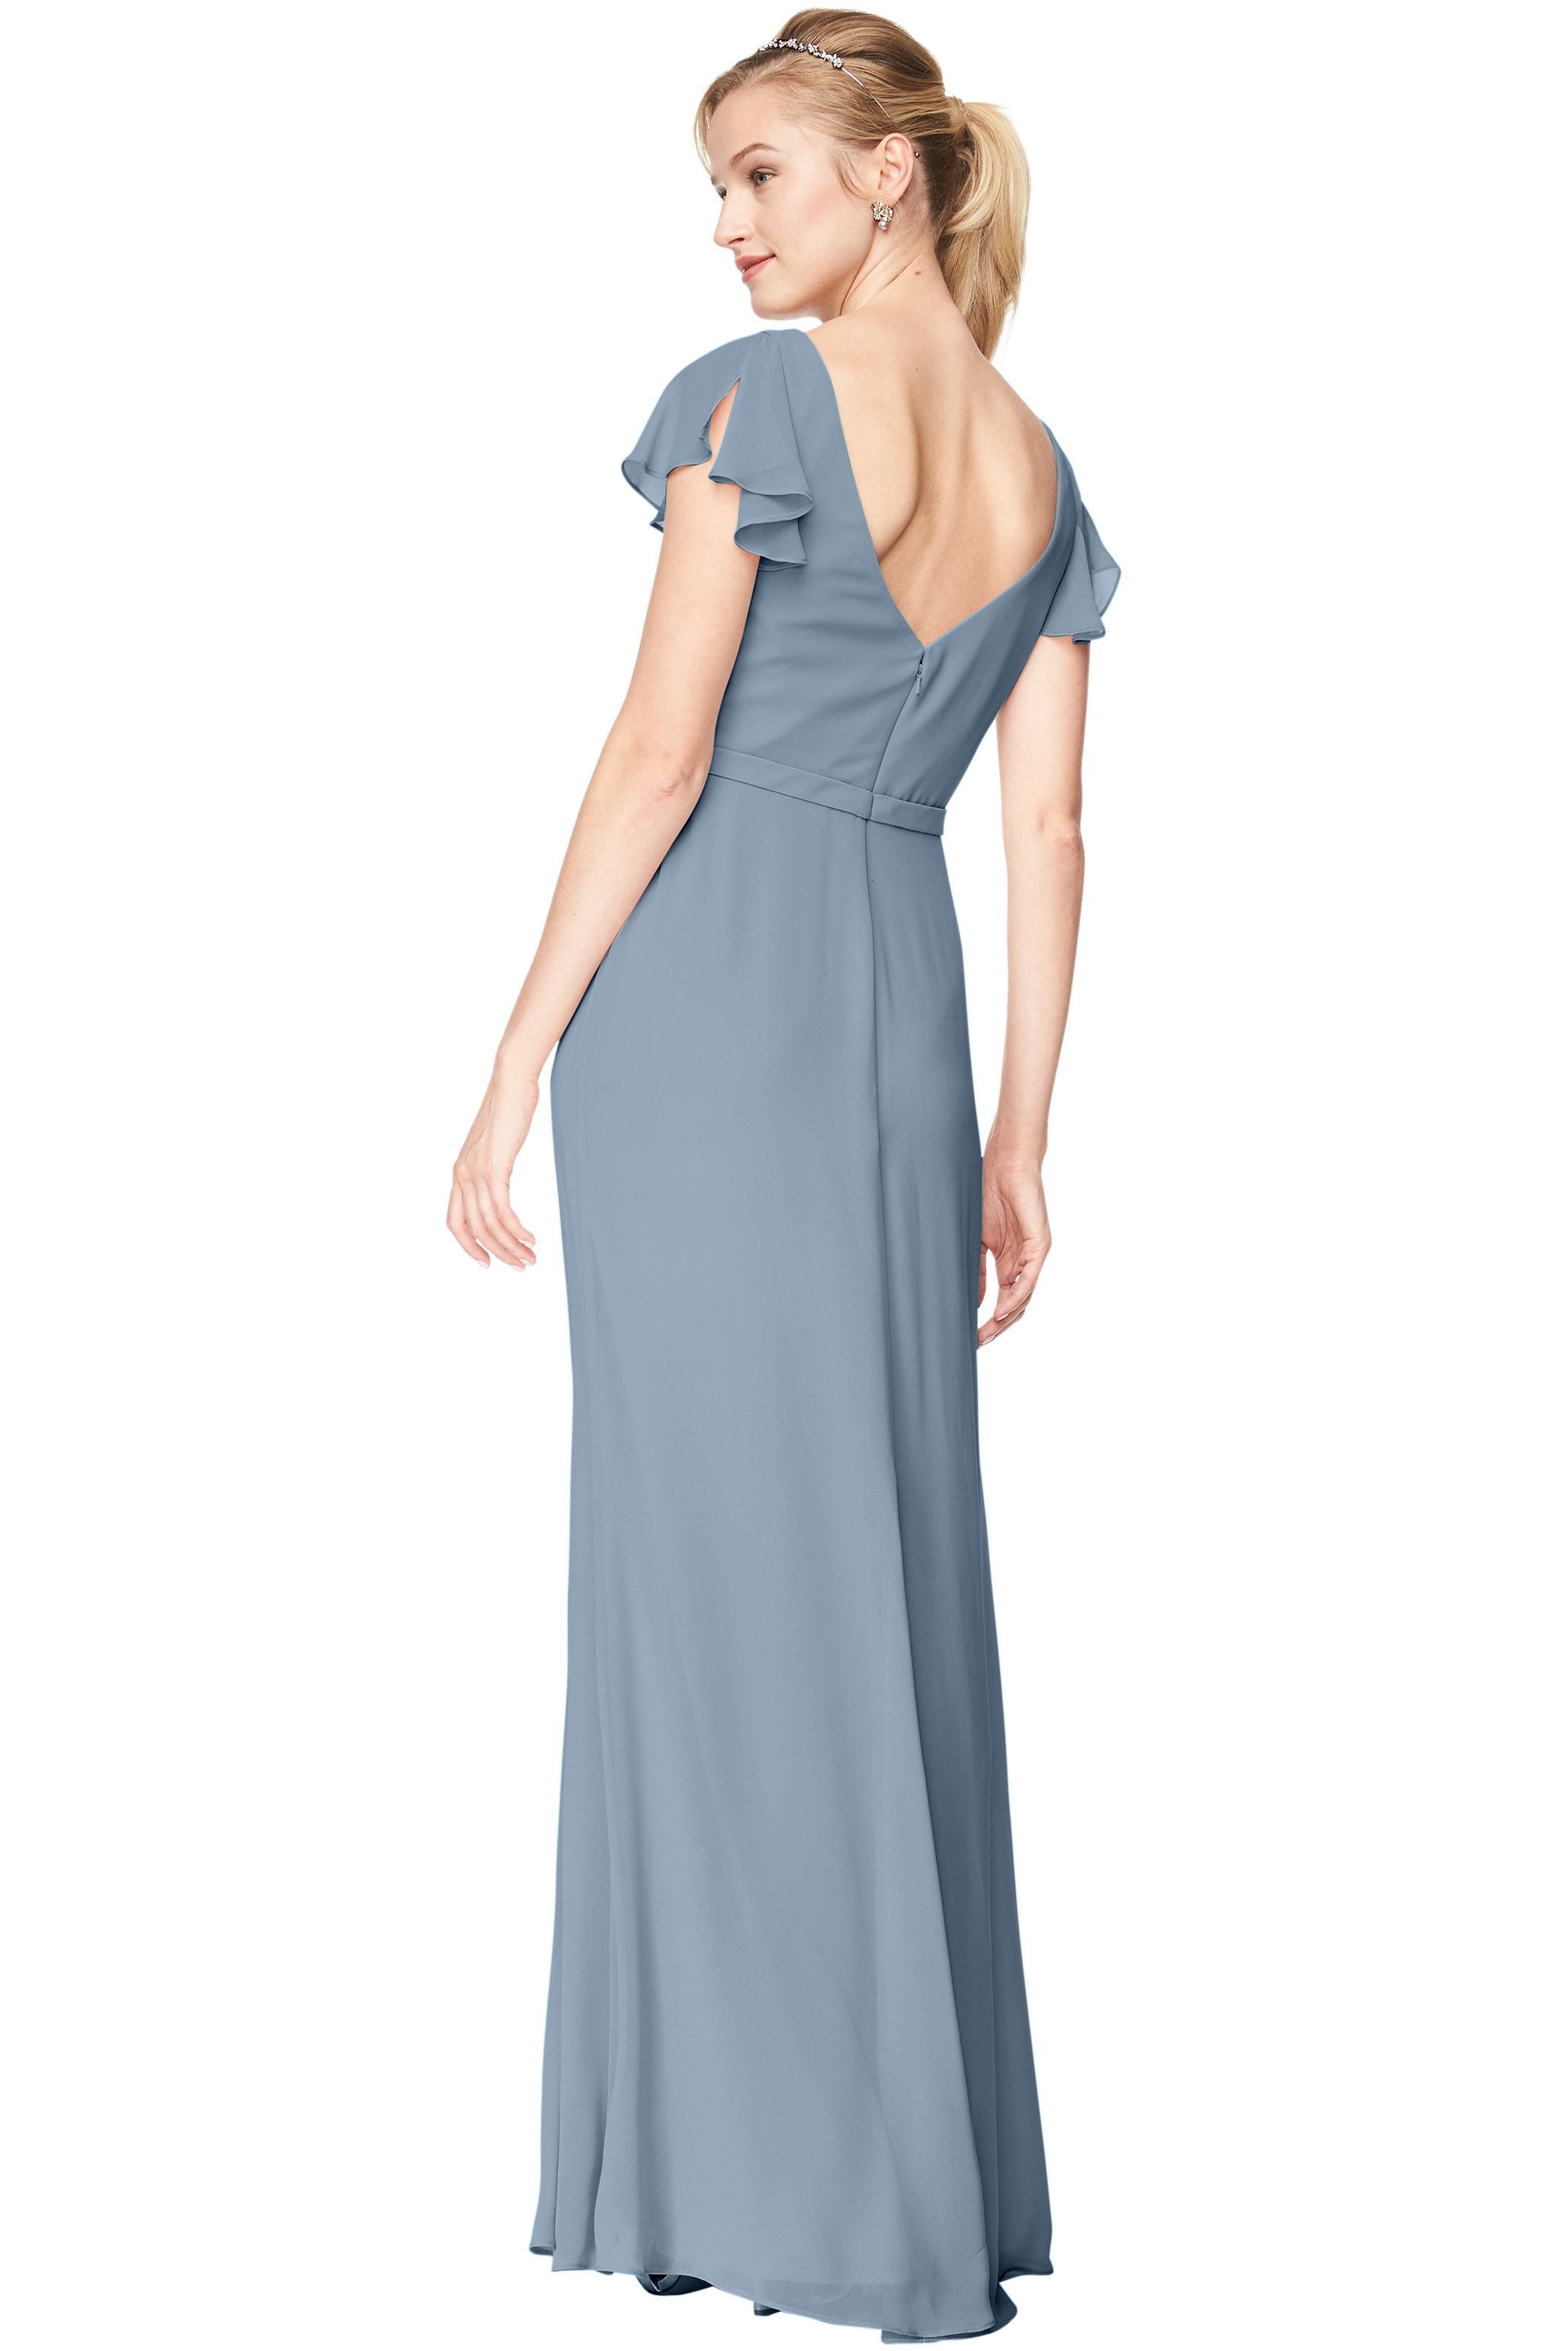 Bill Levkoff SLATE Chiffon V-Neck, Cap Sleeve A-Line gown, $184.00 Back